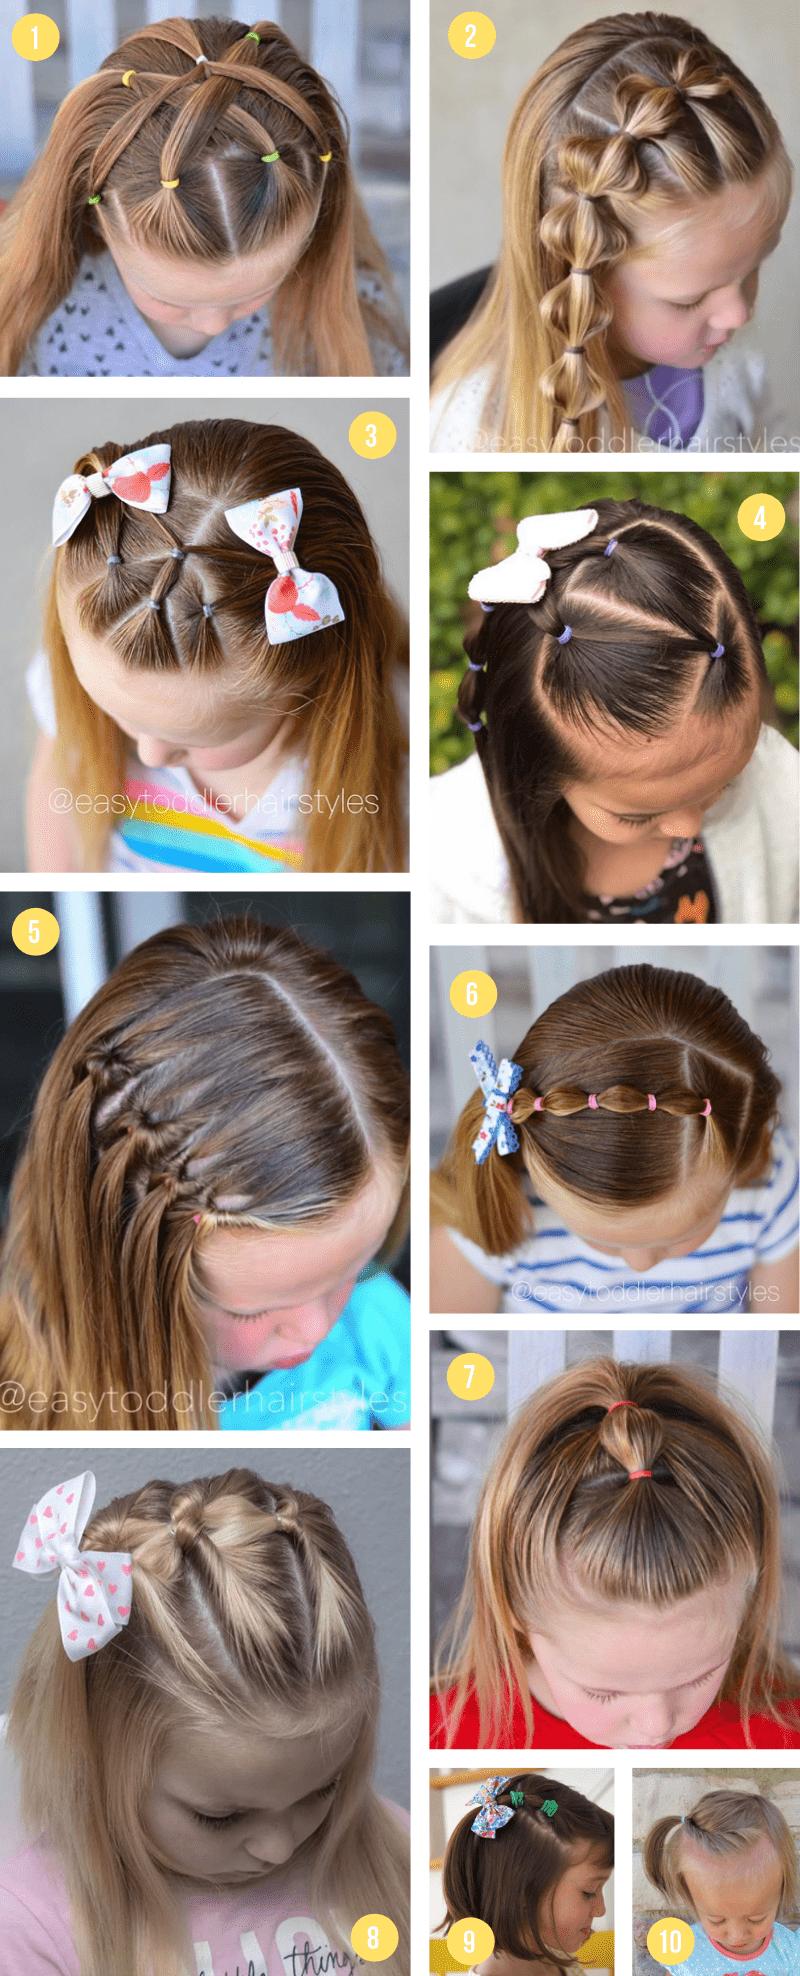 Easy Girls Hairstyles For Toddlers Tweens Teens What Moms Love